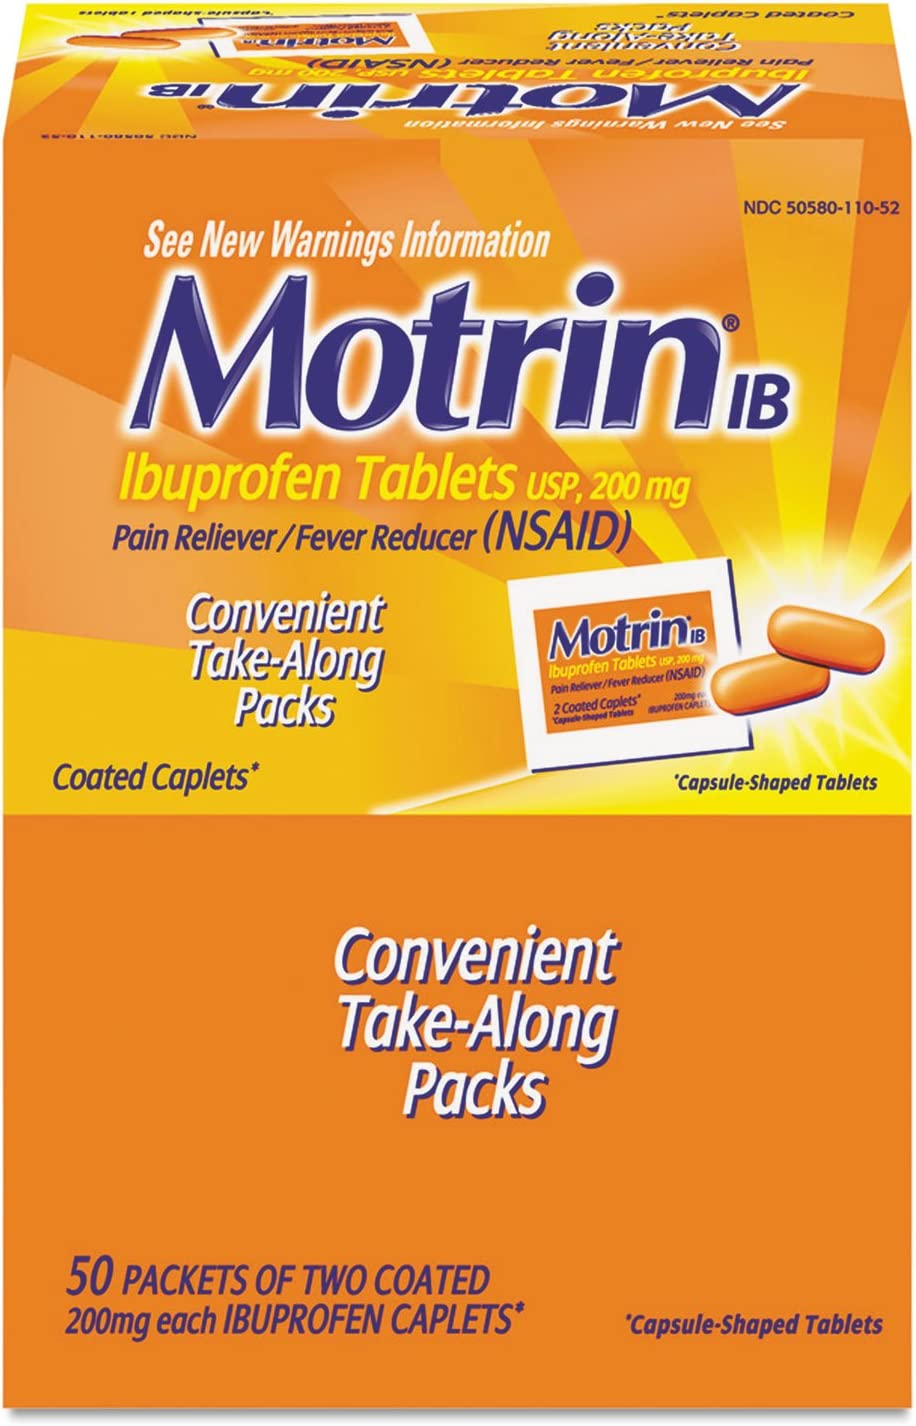 Ibuprofen Tablets, 50 Packets of 2 per Box